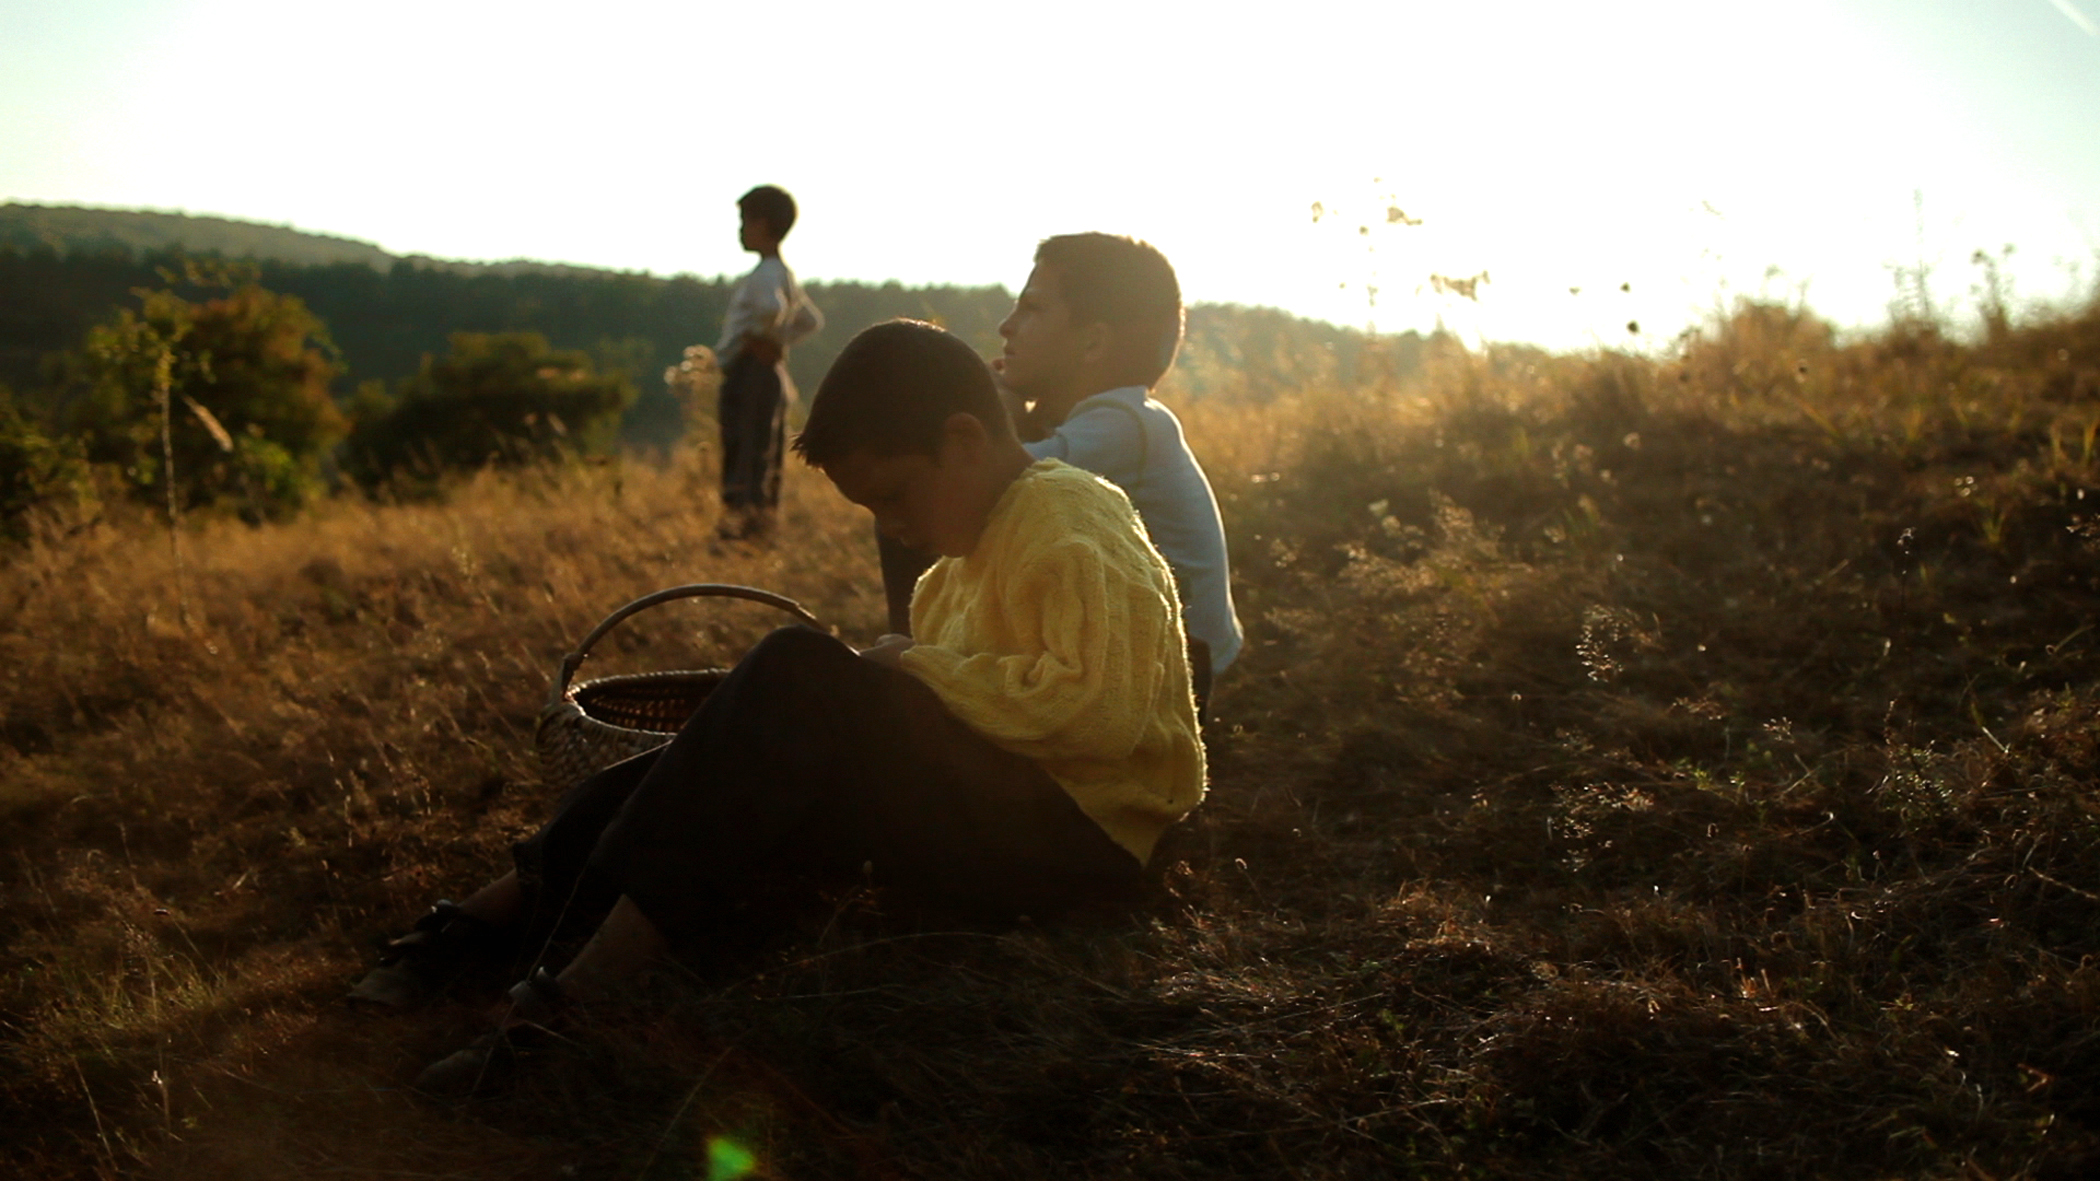 11_PADUREA_filmstill_Beniamin_Iosif and